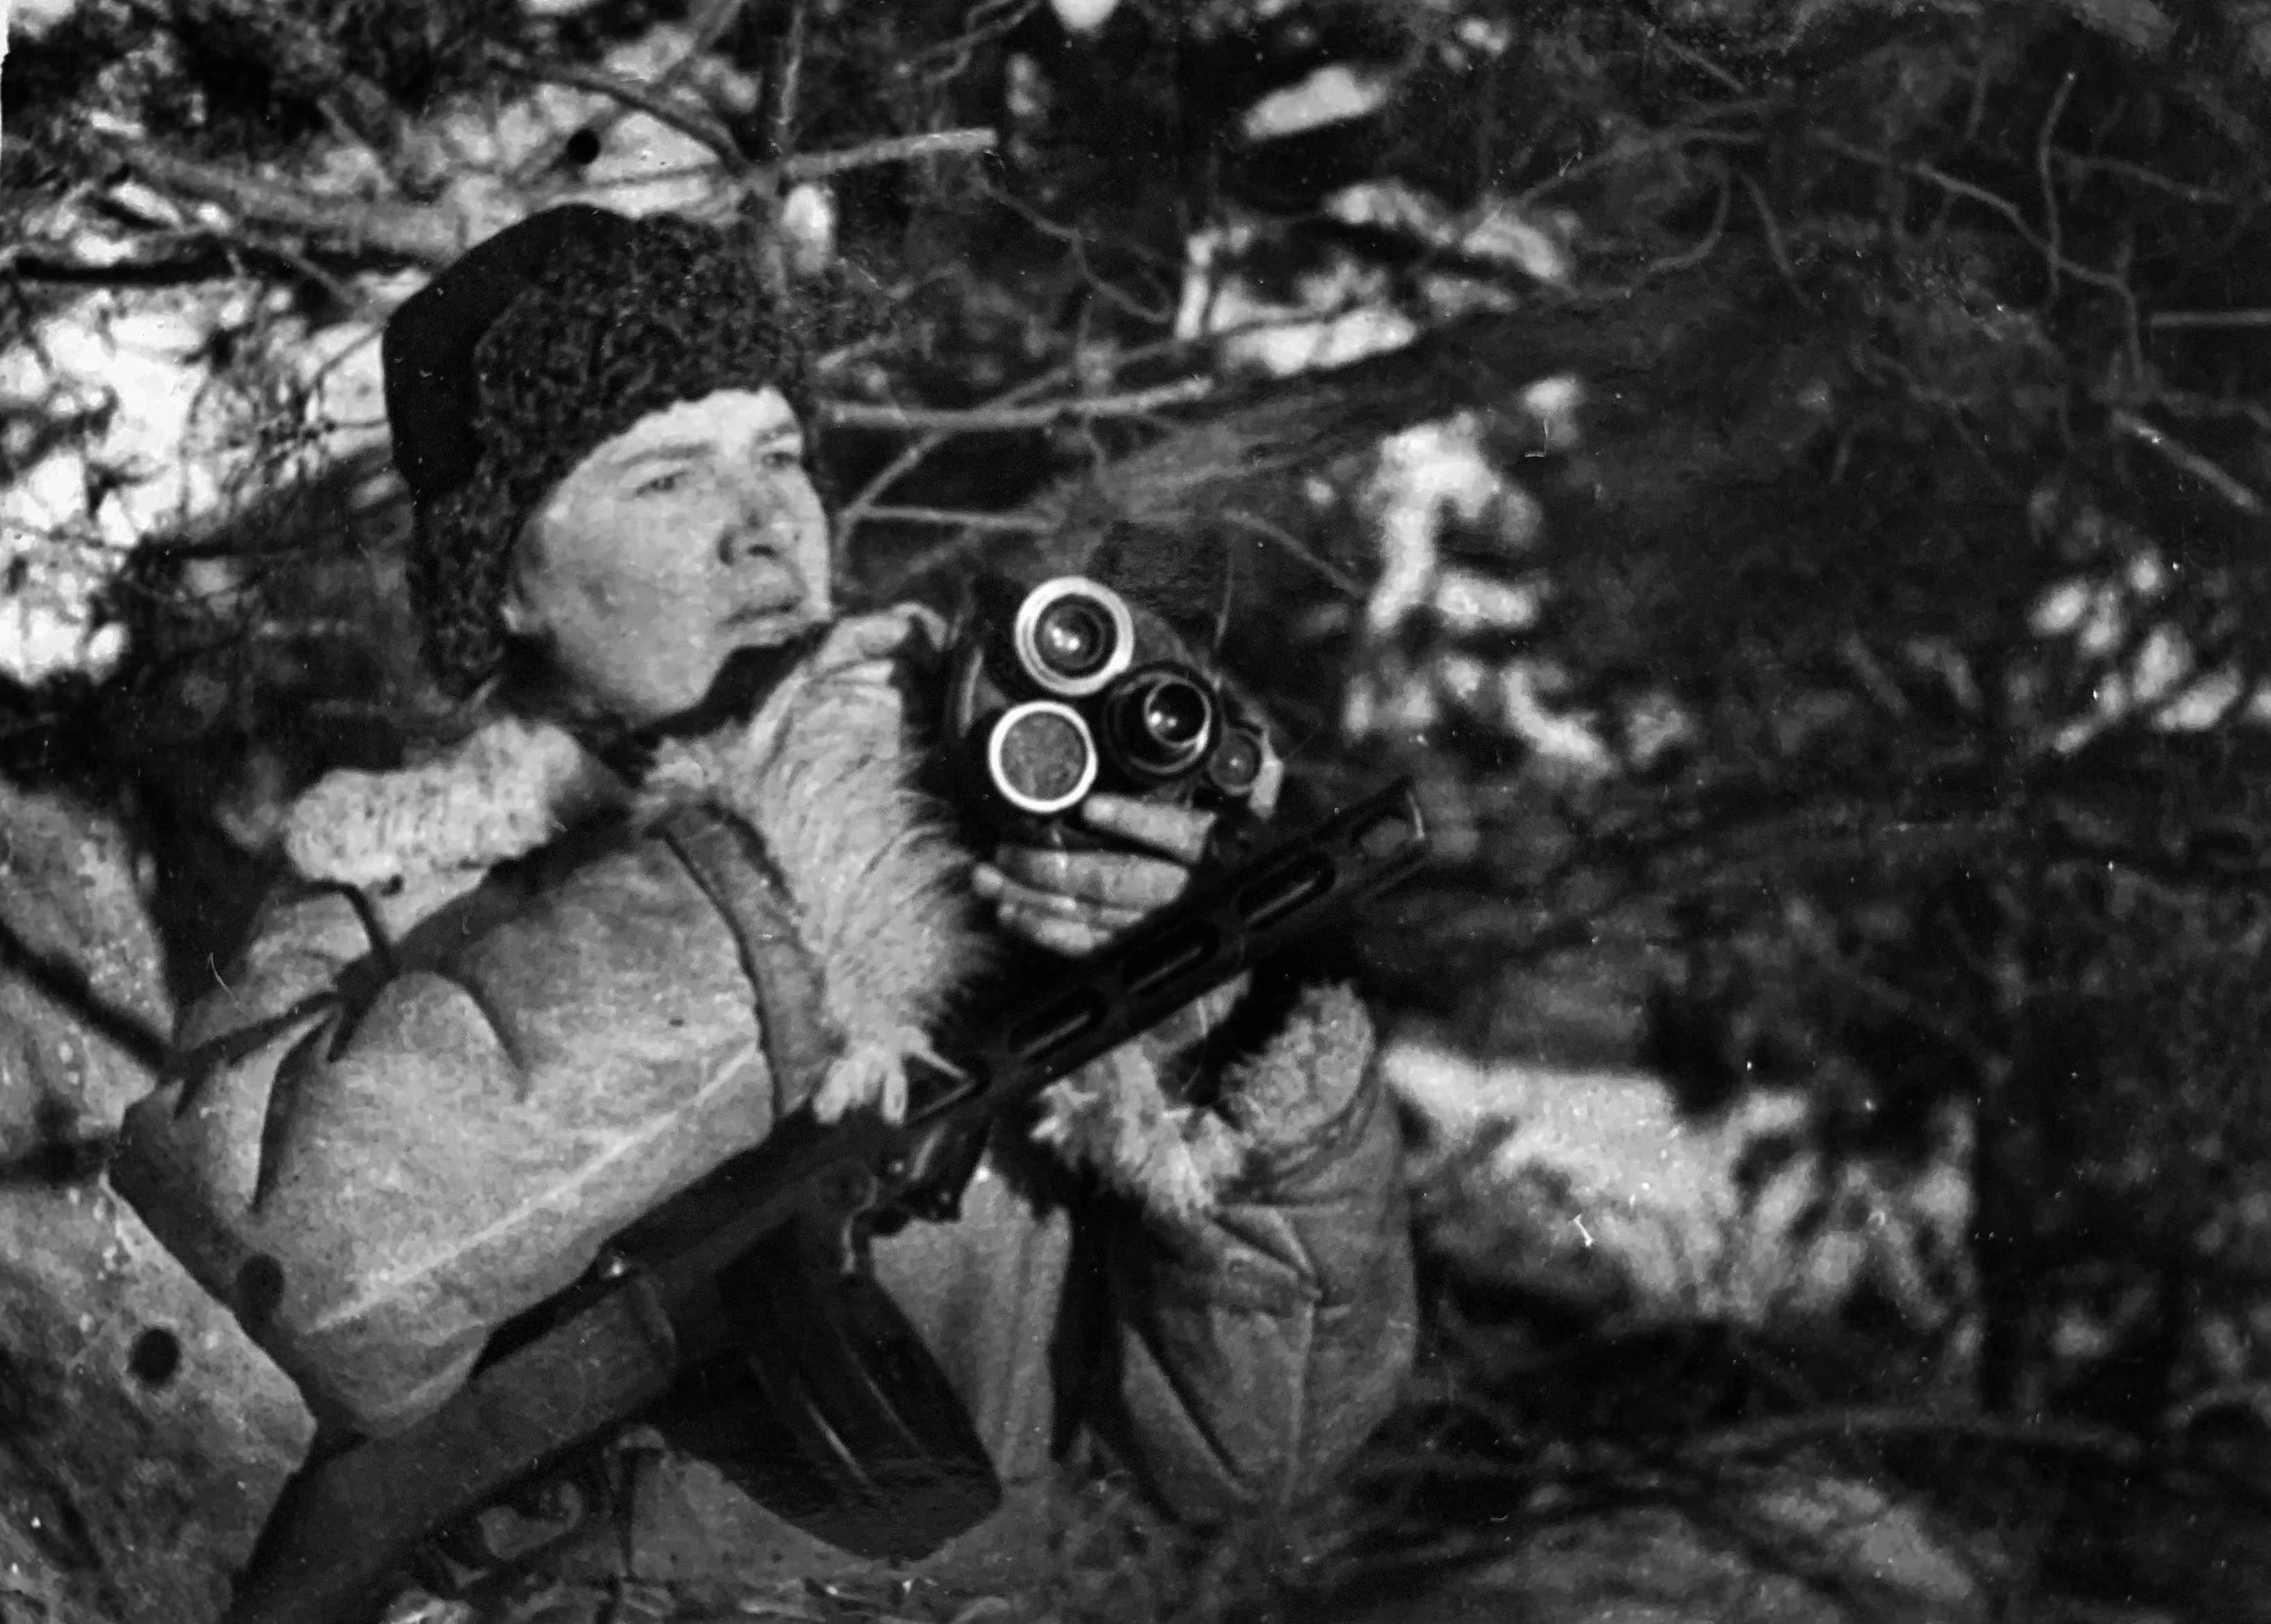 Экспонат #8. Завертелась ручка киноаппарата... 1943 год